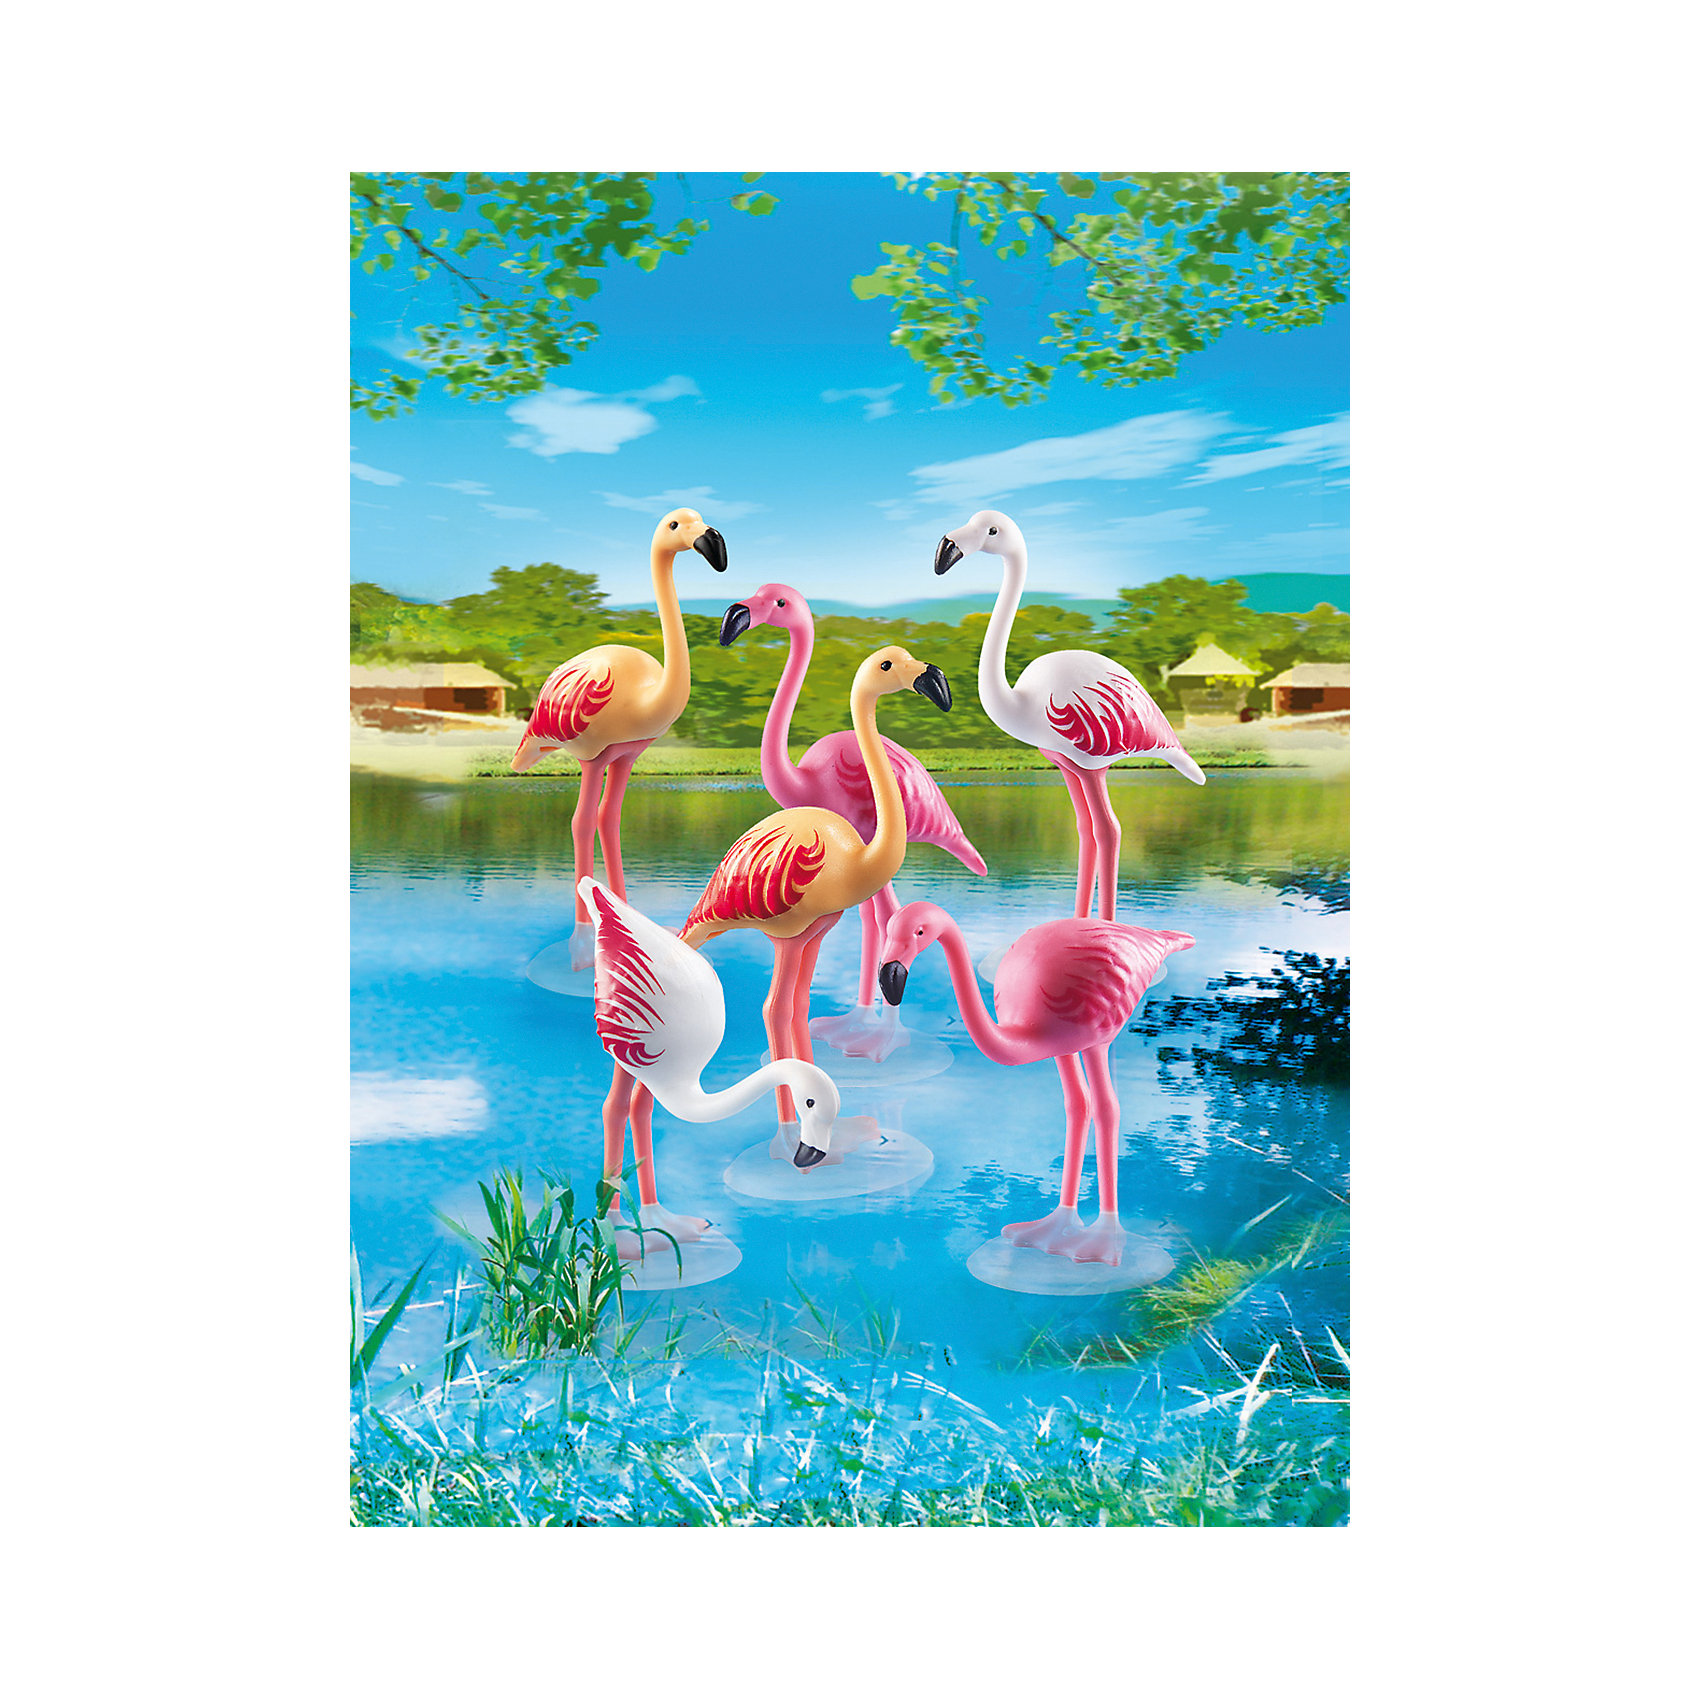 Зоопарк: Стая Фламинго, PLAYMOBILПластмассовые конструкторы<br><br><br>Ширина мм: 174<br>Глубина мм: 119<br>Высота мм: 35<br>Вес г: 37<br>Возраст от месяцев: 48<br>Возраст до месяцев: 120<br>Пол: Унисекс<br>Возраст: Детский<br>SKU: 3786377